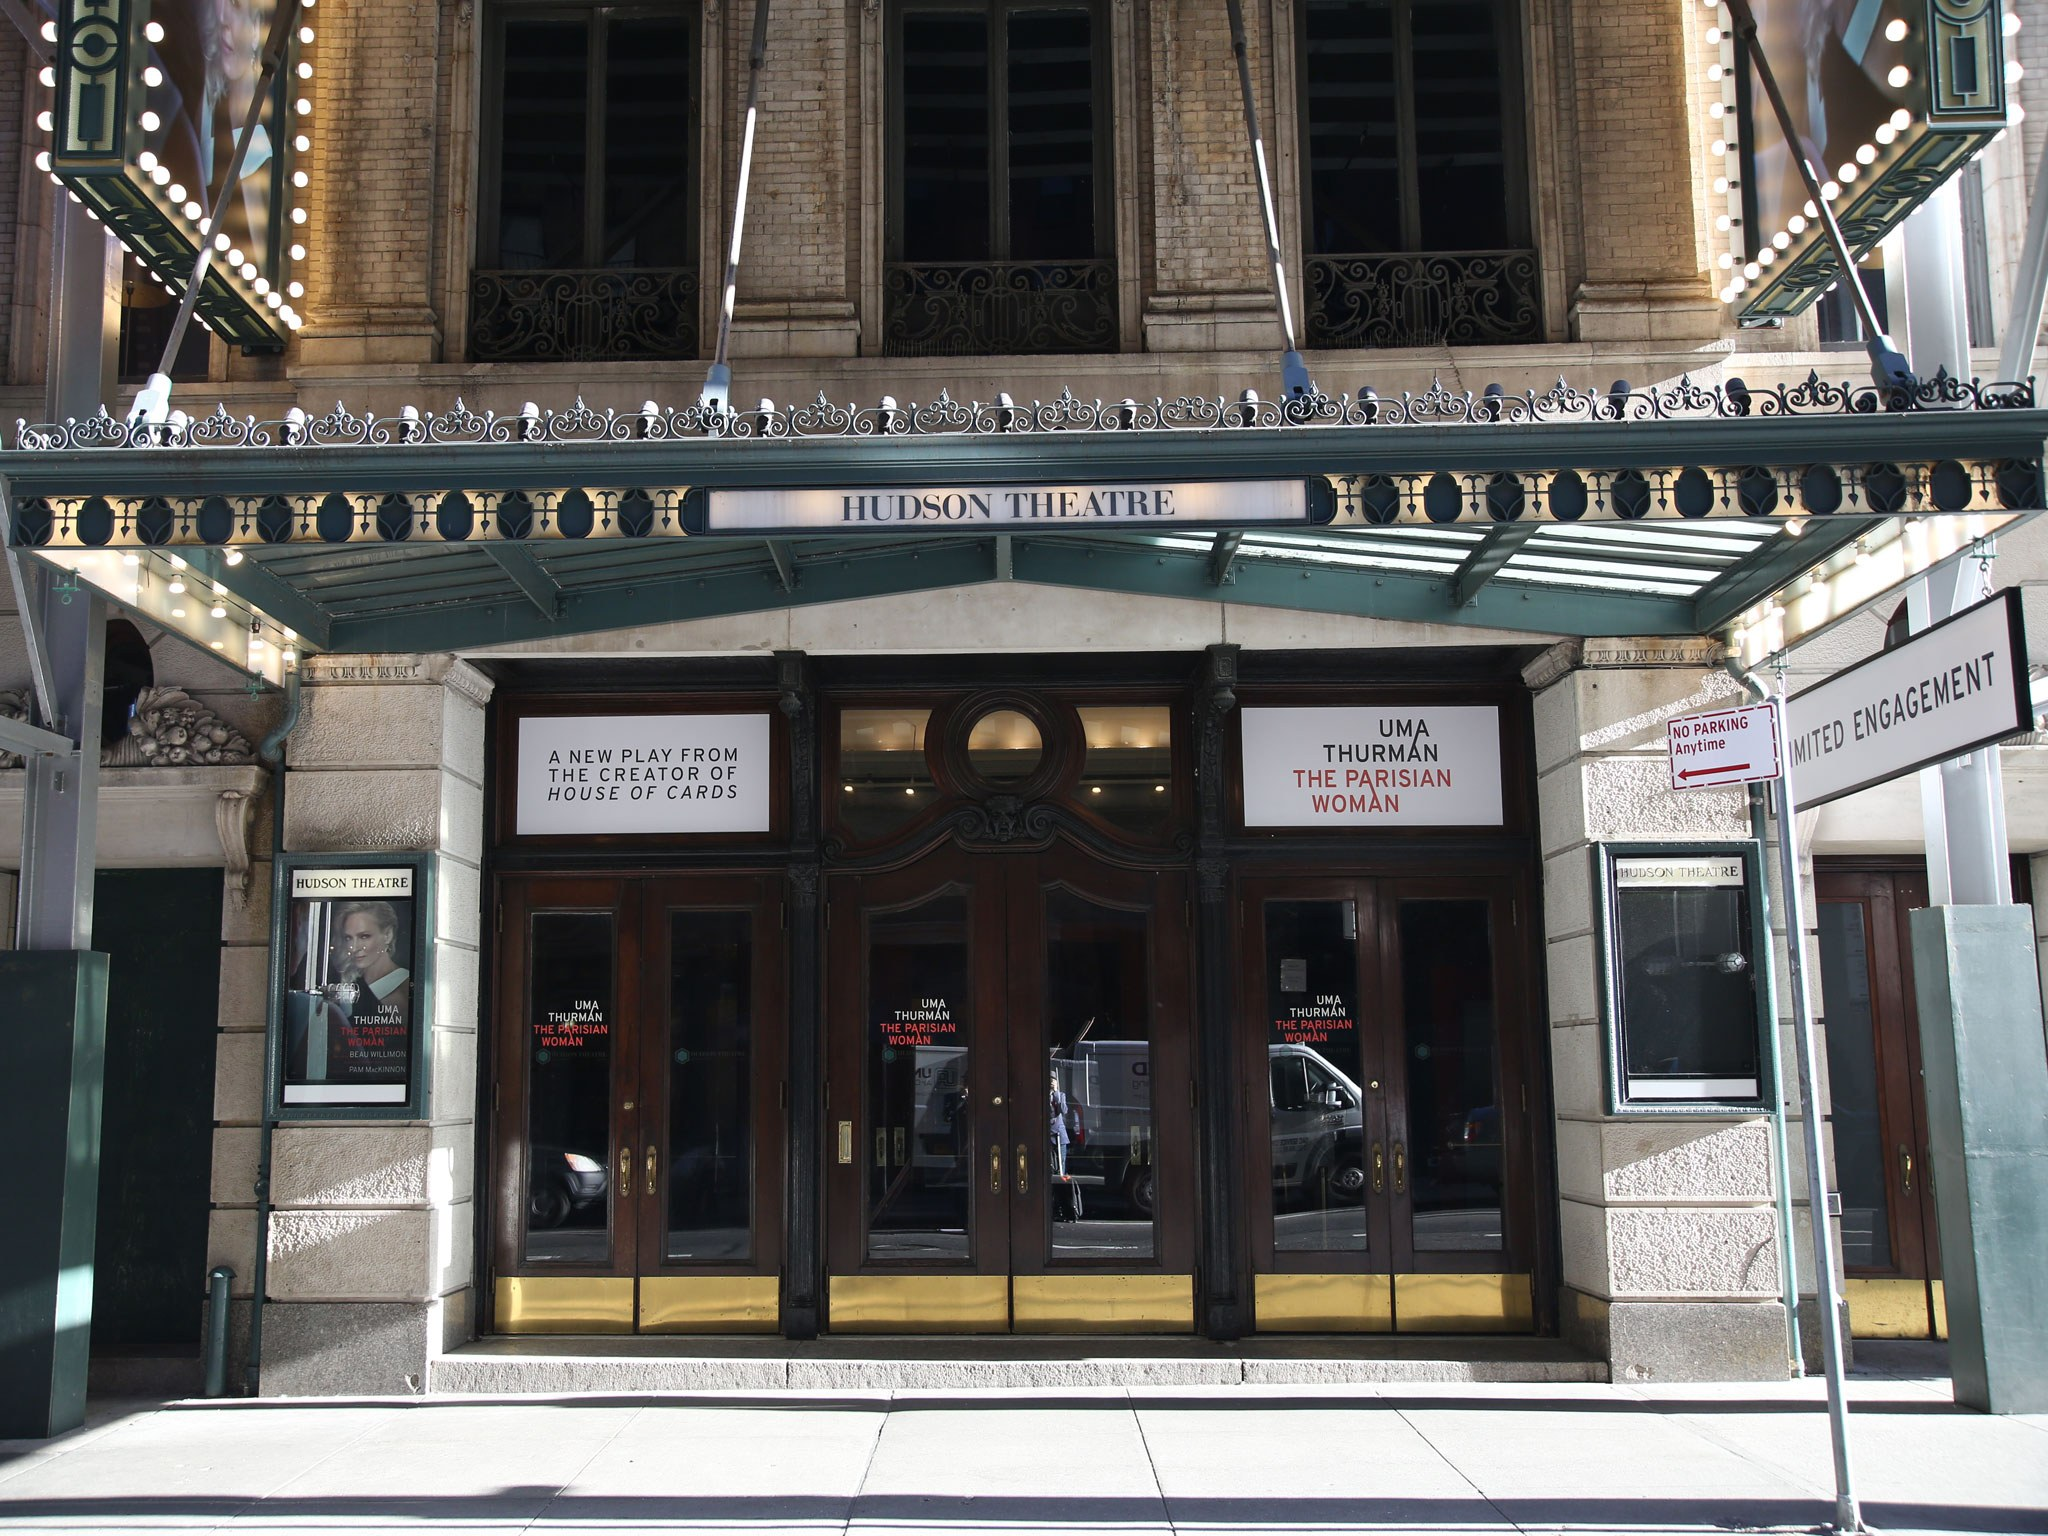 Parisian Woman Broadway Theatre Marquee